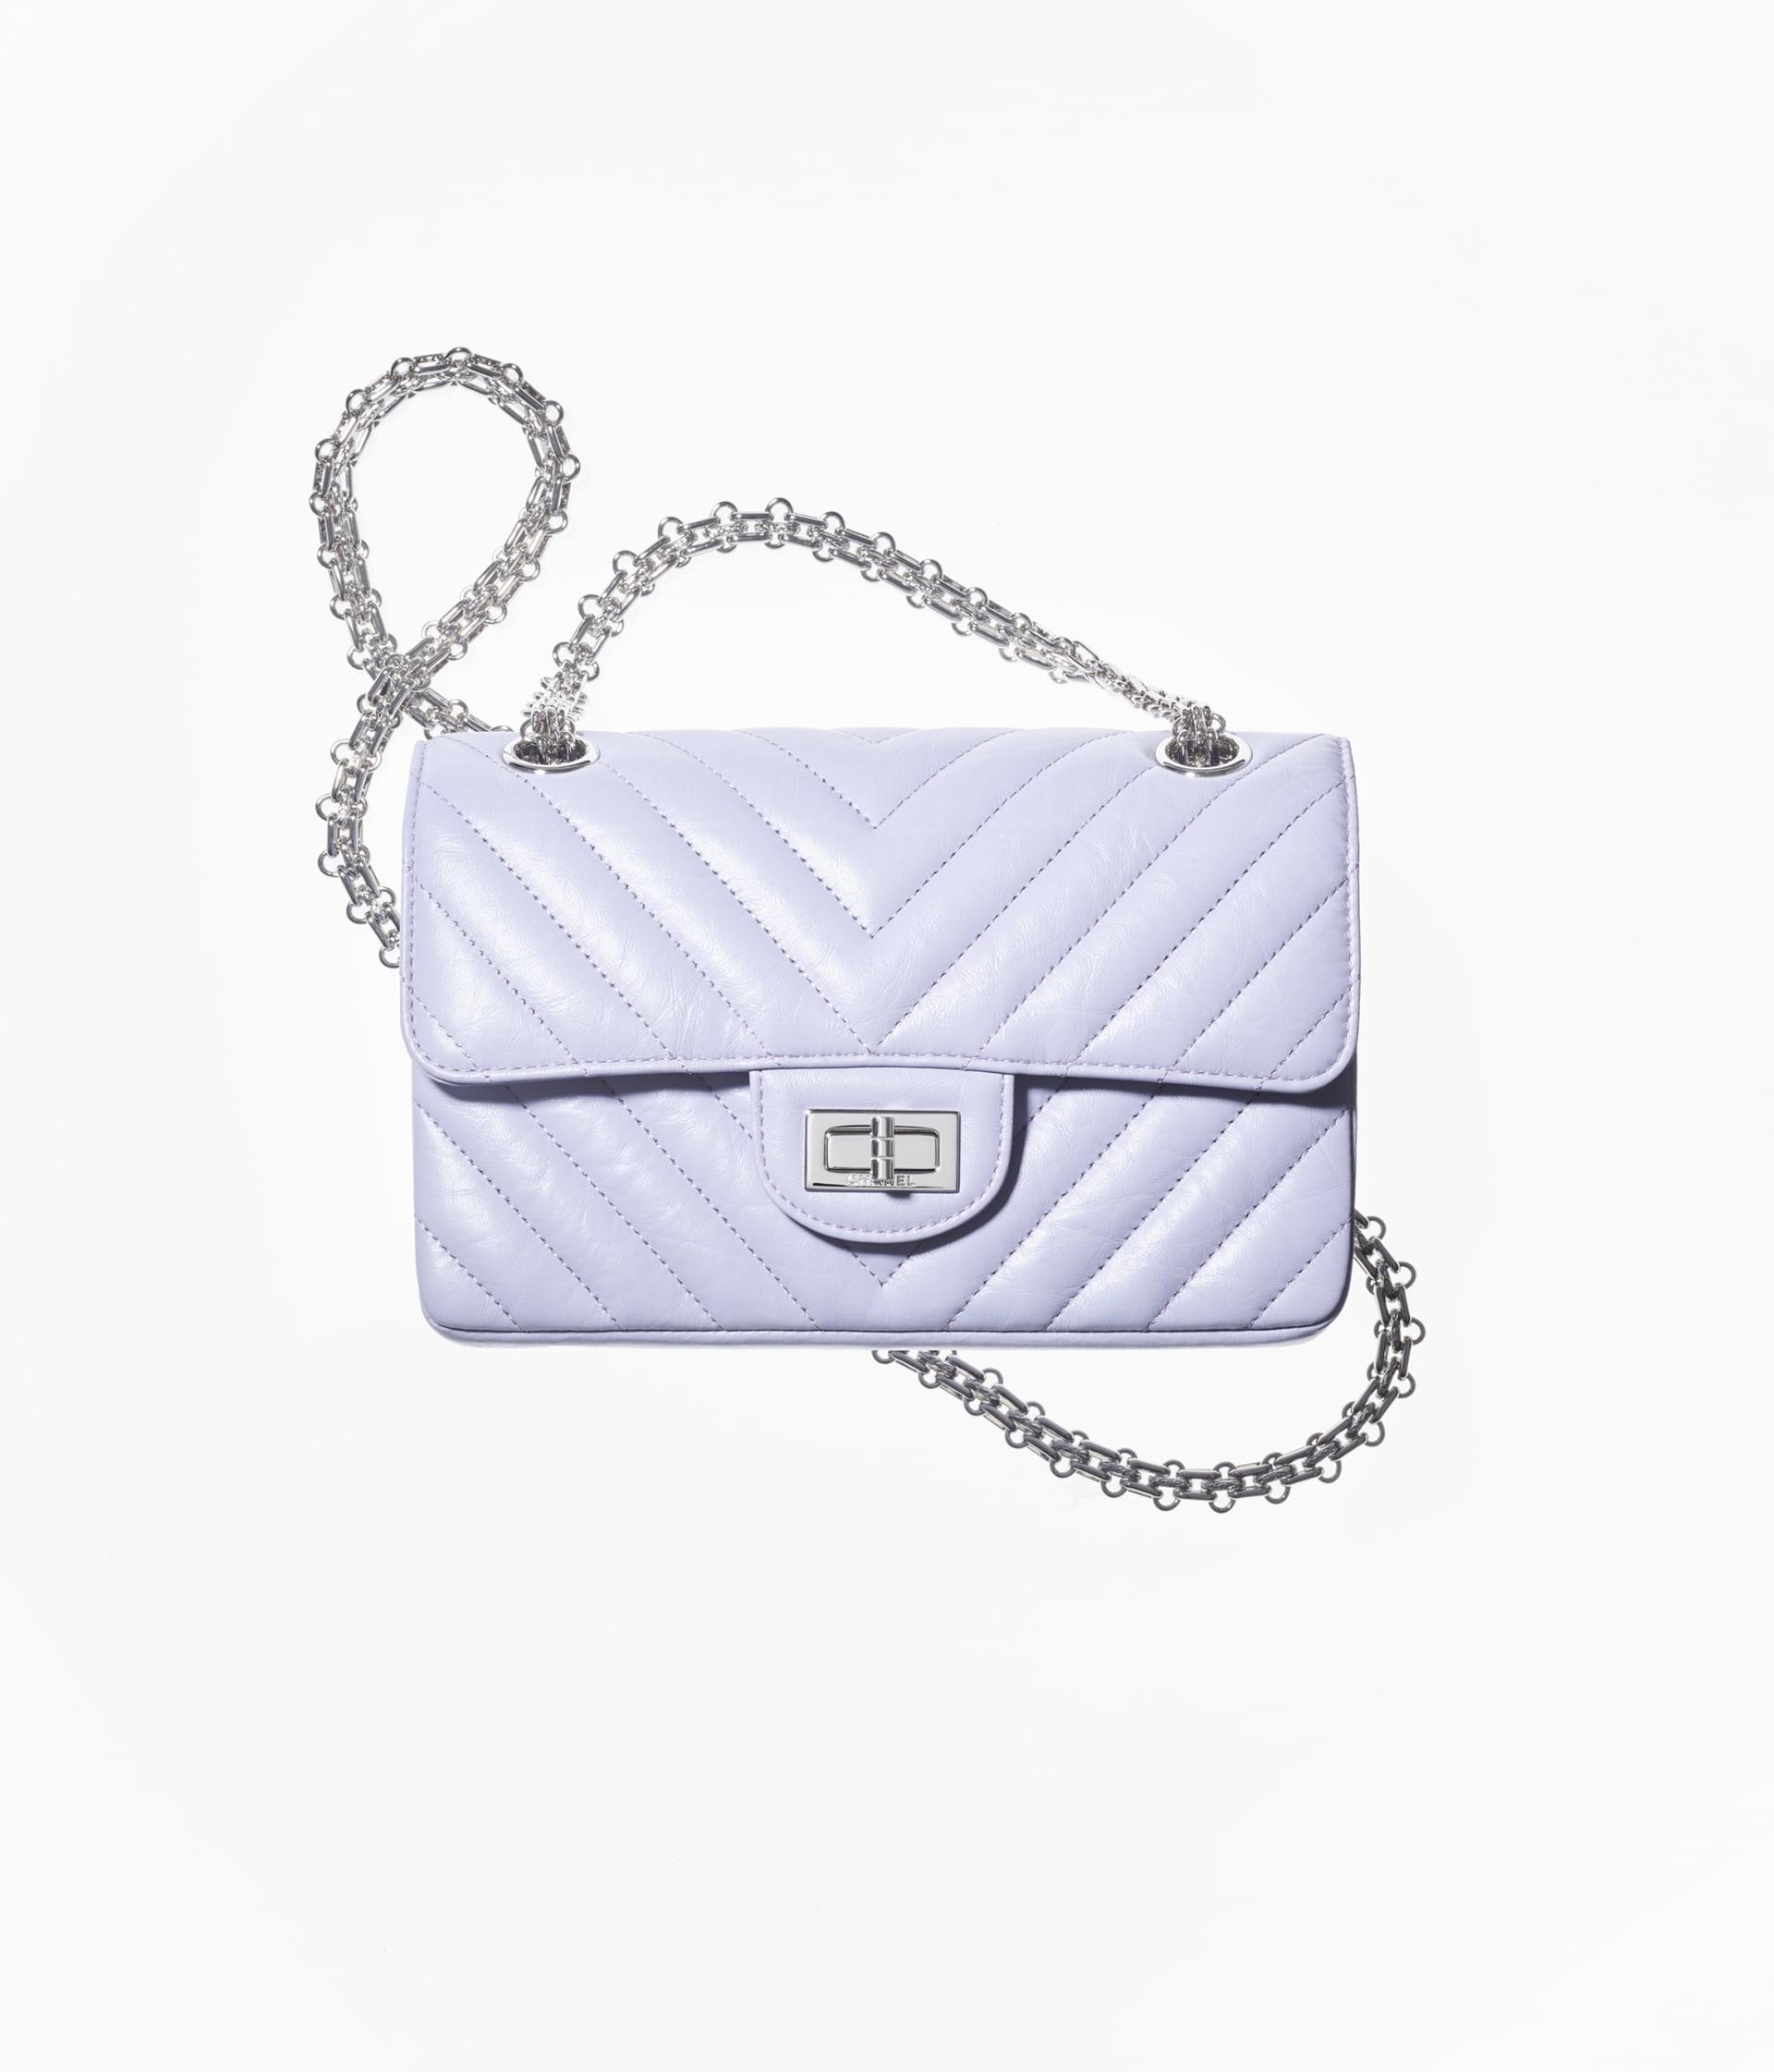 image 1 - Mini 2.55 Handbag - Aged Calfskin & Silver-Tone Metal - Light Purple